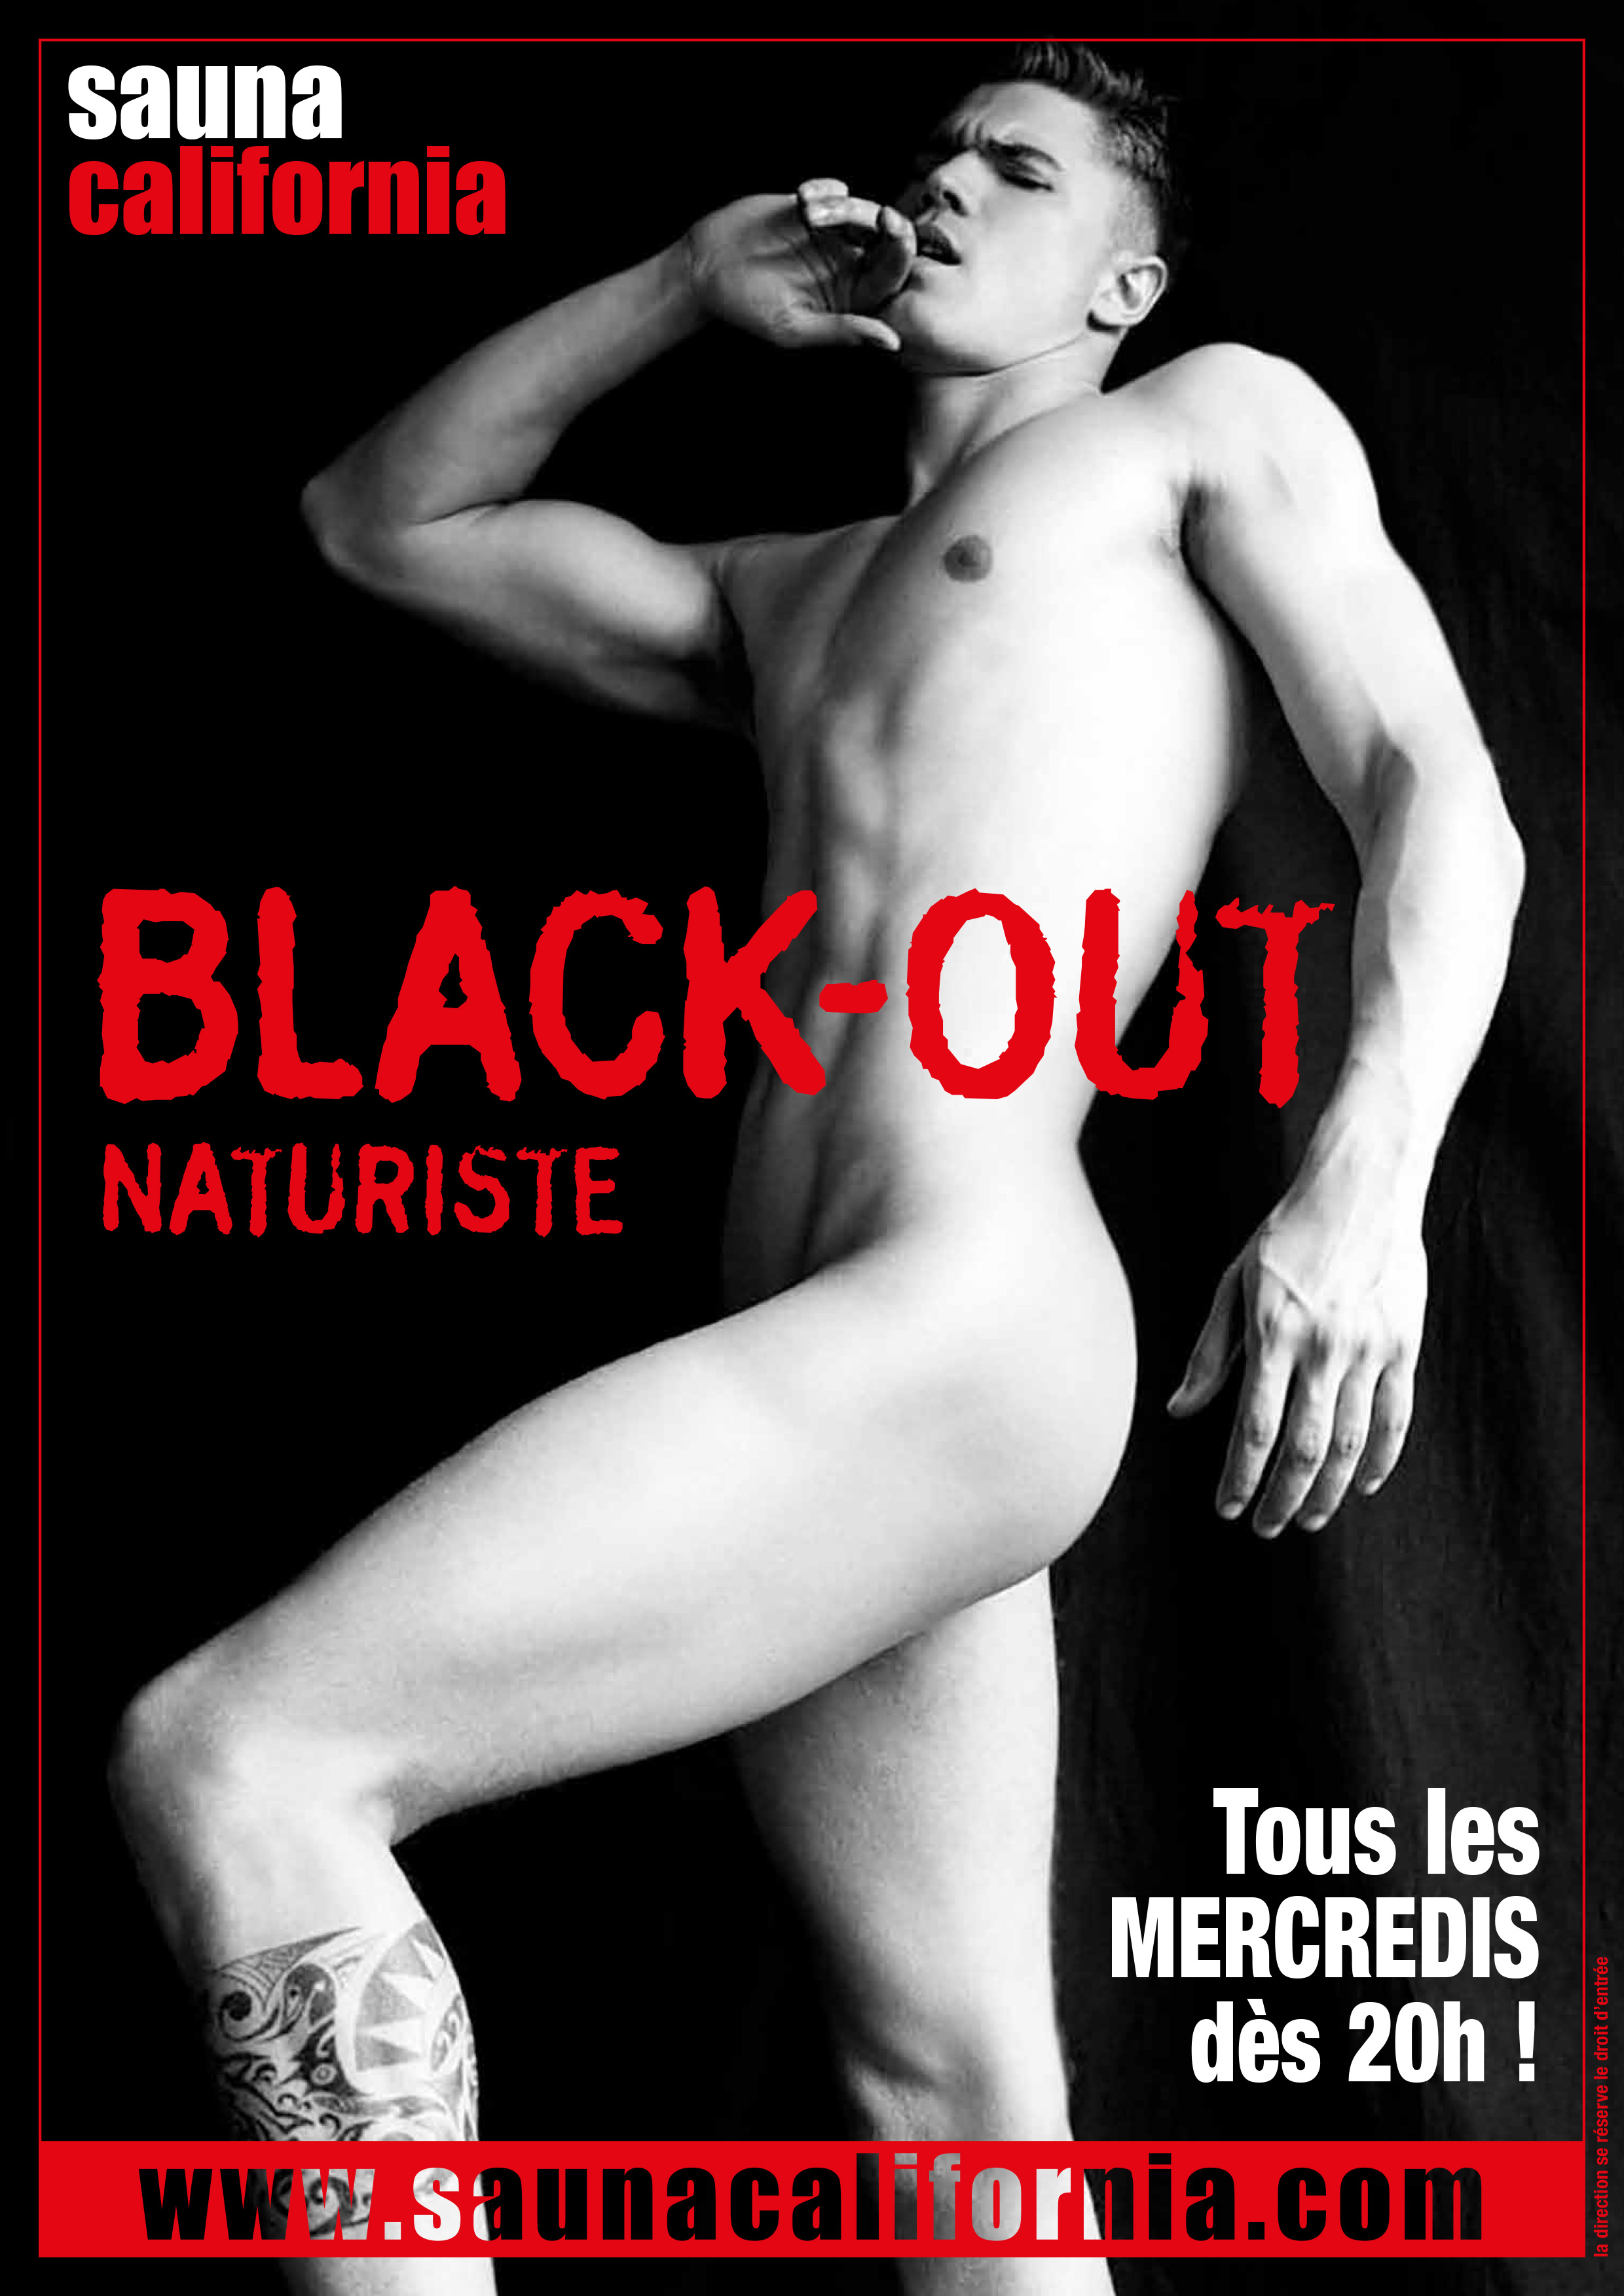 blackout-naturiste-v-mars19